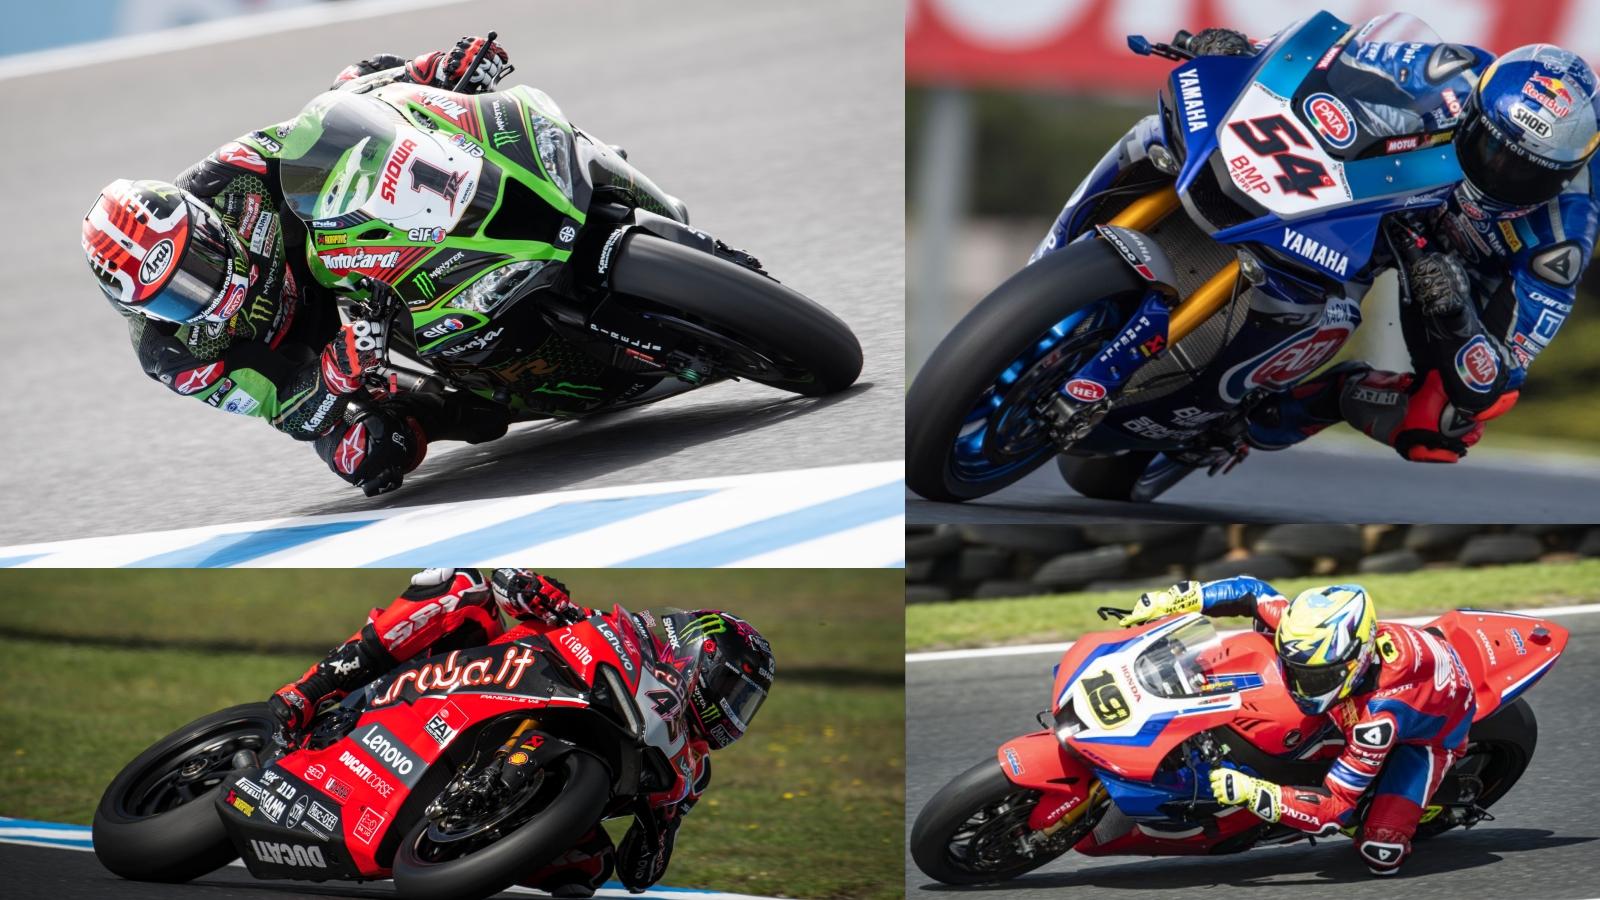 Superbike 2020: pilotos, motos, equipos, calendario, 3 españoles y cinco favoritos